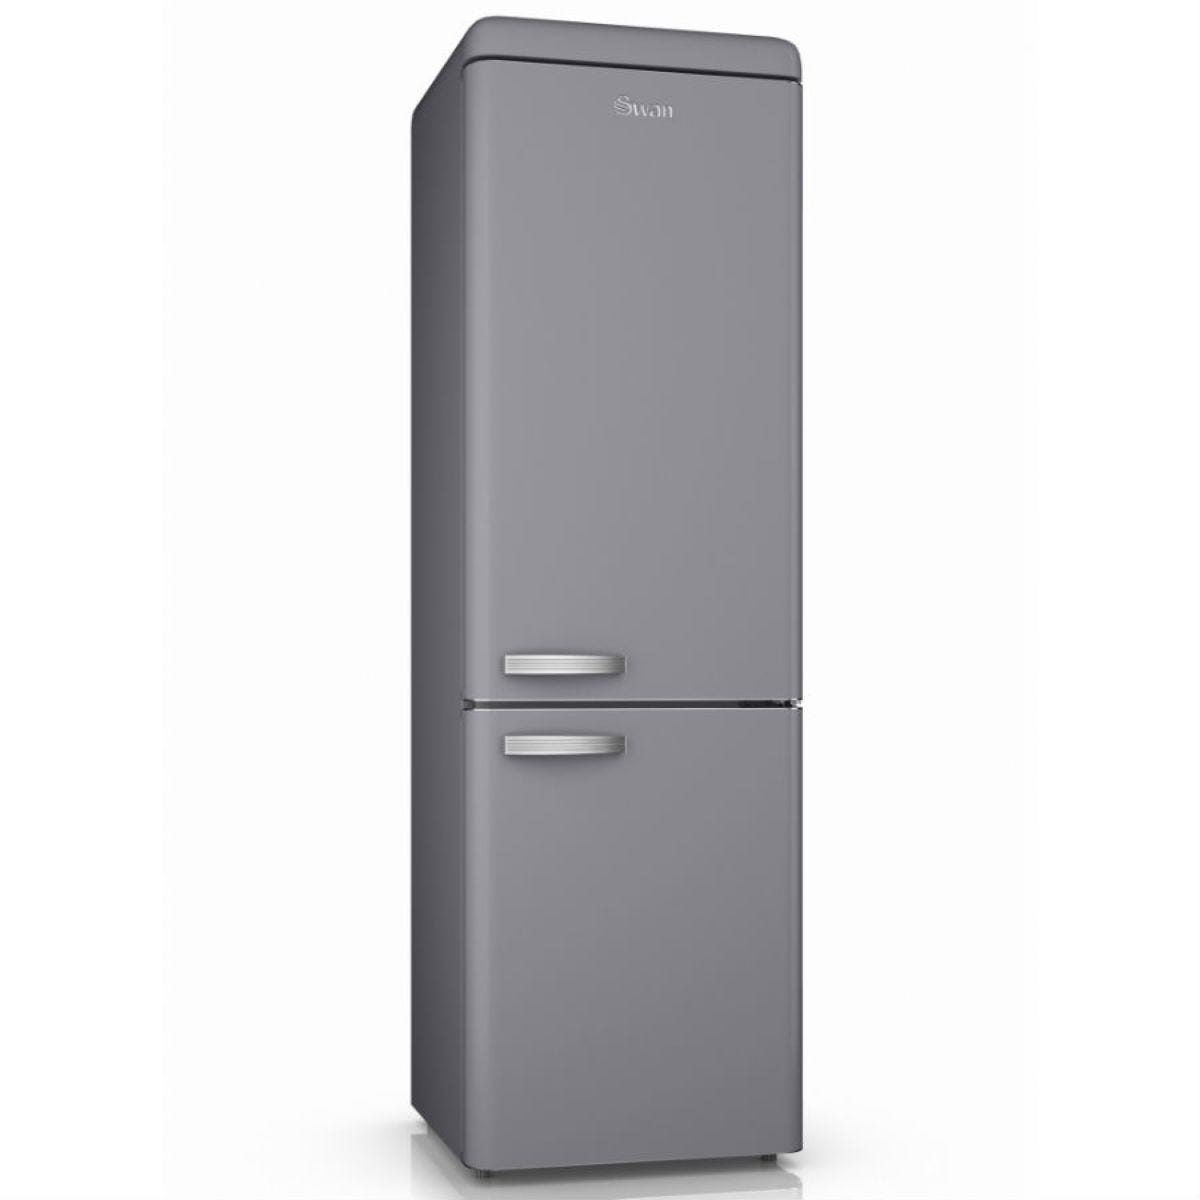 Swan SR11020GRN Retro 300L Frost Free Fridge Freezer - Grey